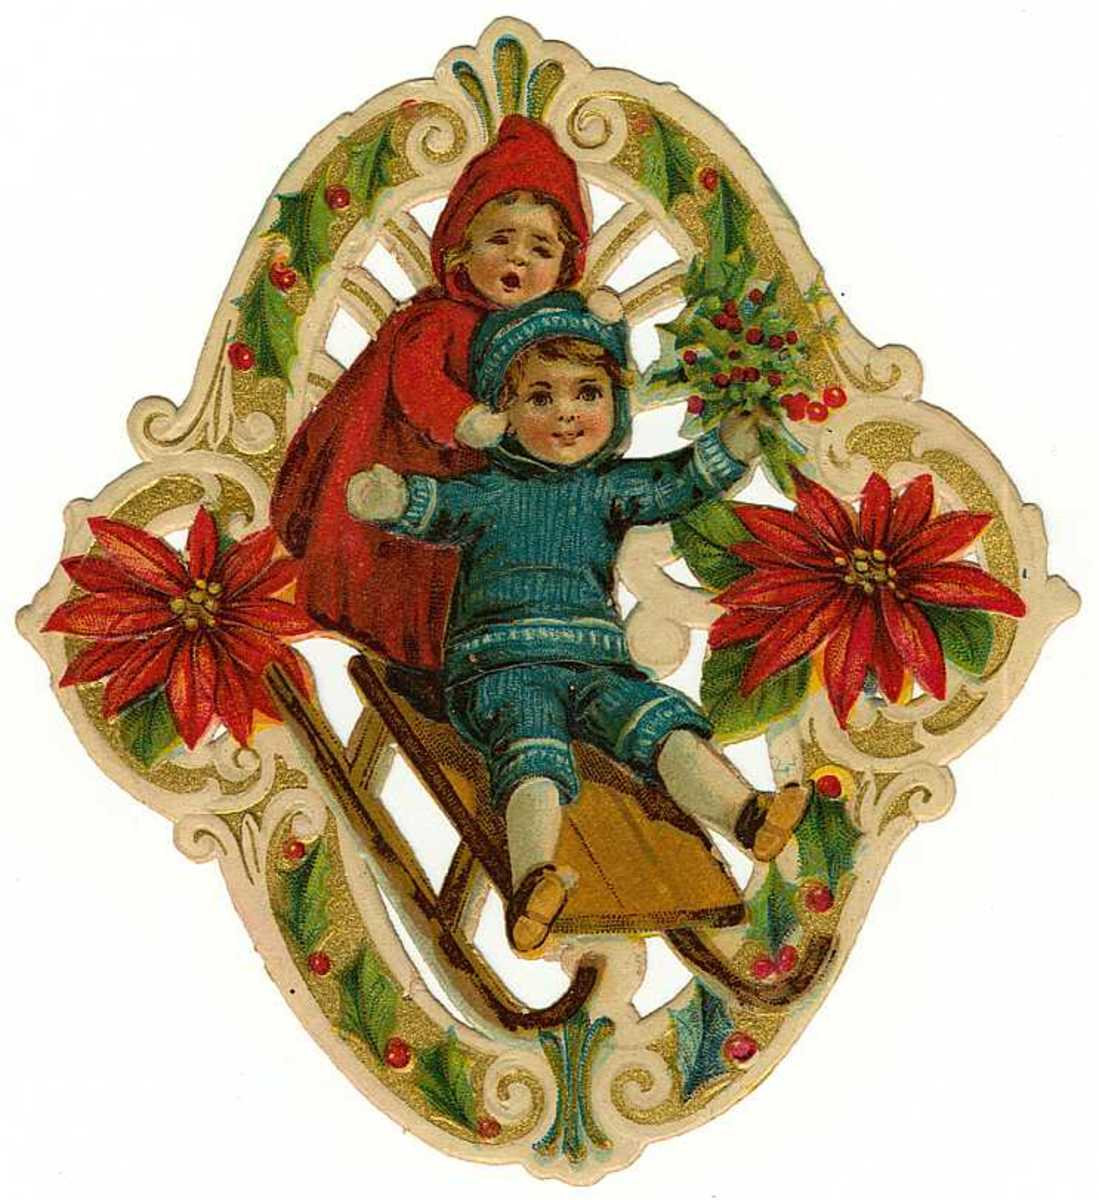 Vintage Christmas images:  Children on a sled